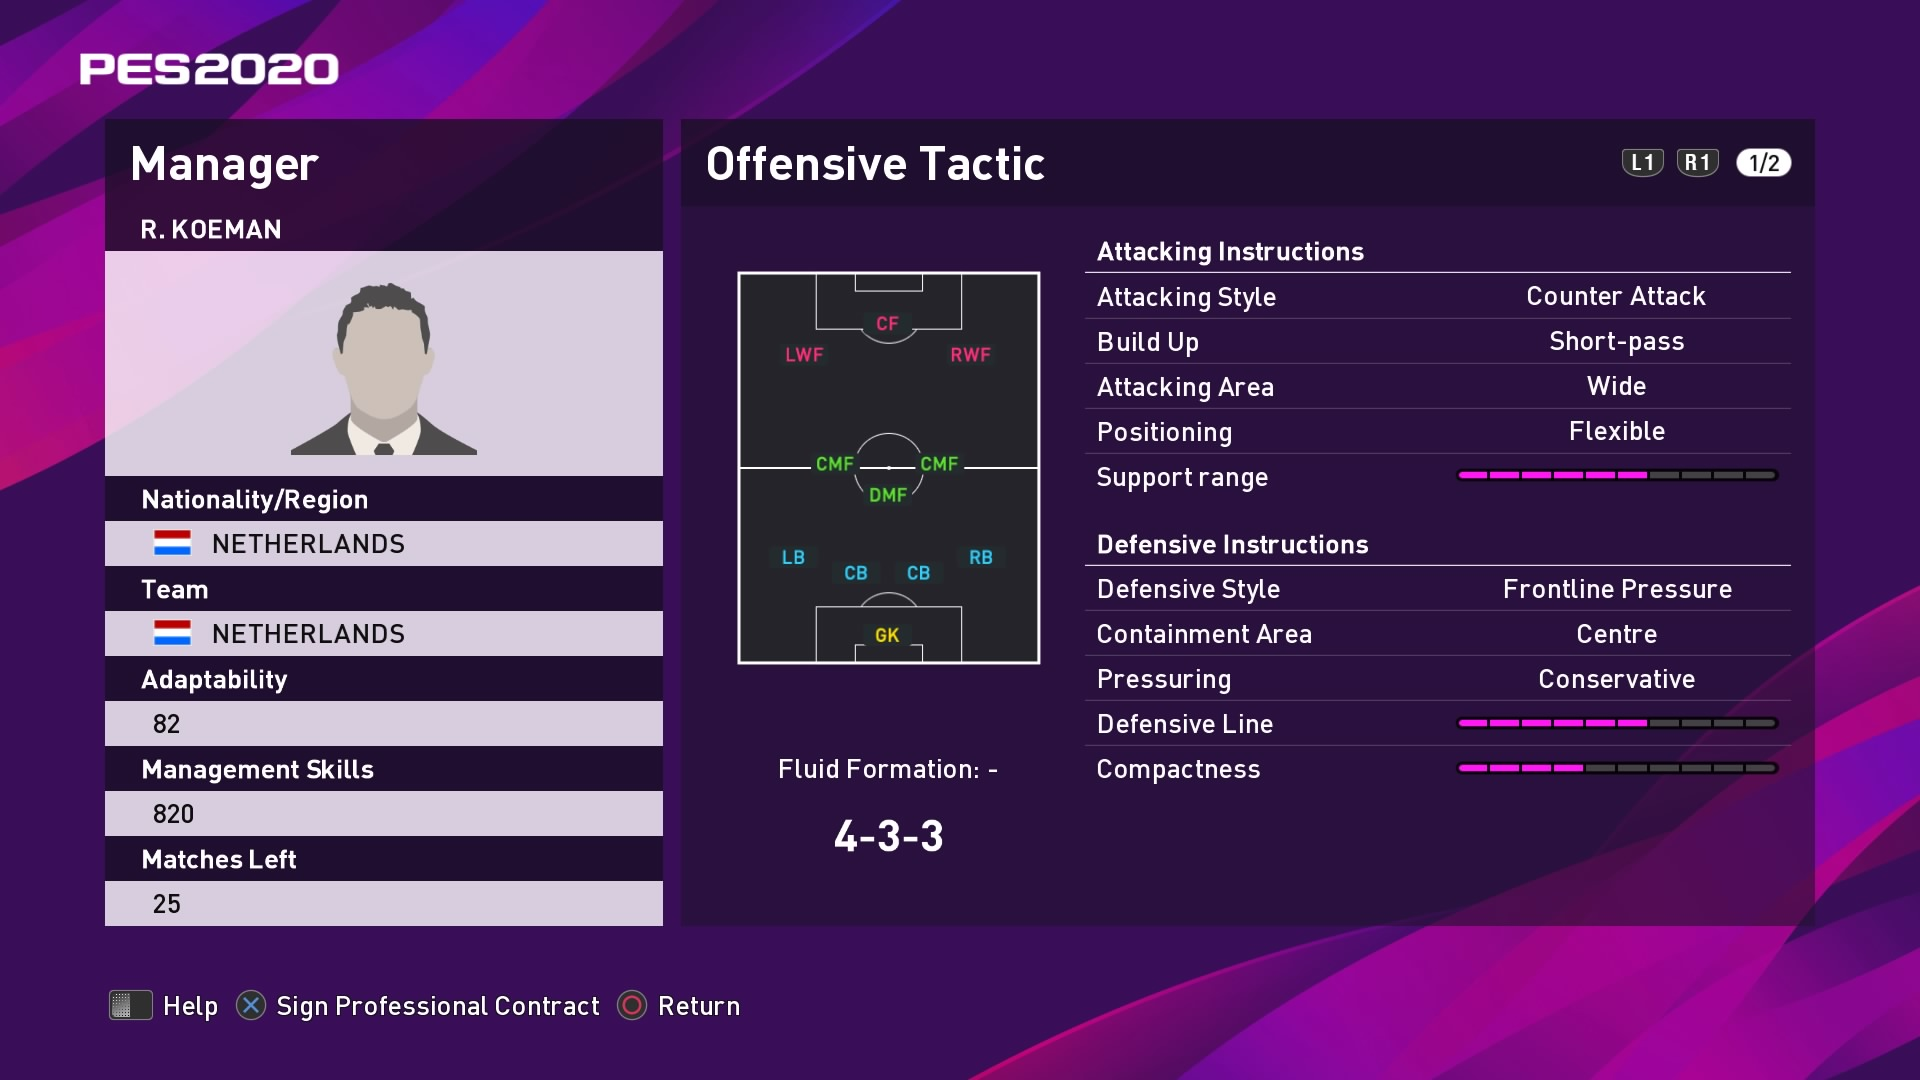 R. Koeman (Ronald Koeman) Offensive Tactic in PES 2020 myClub